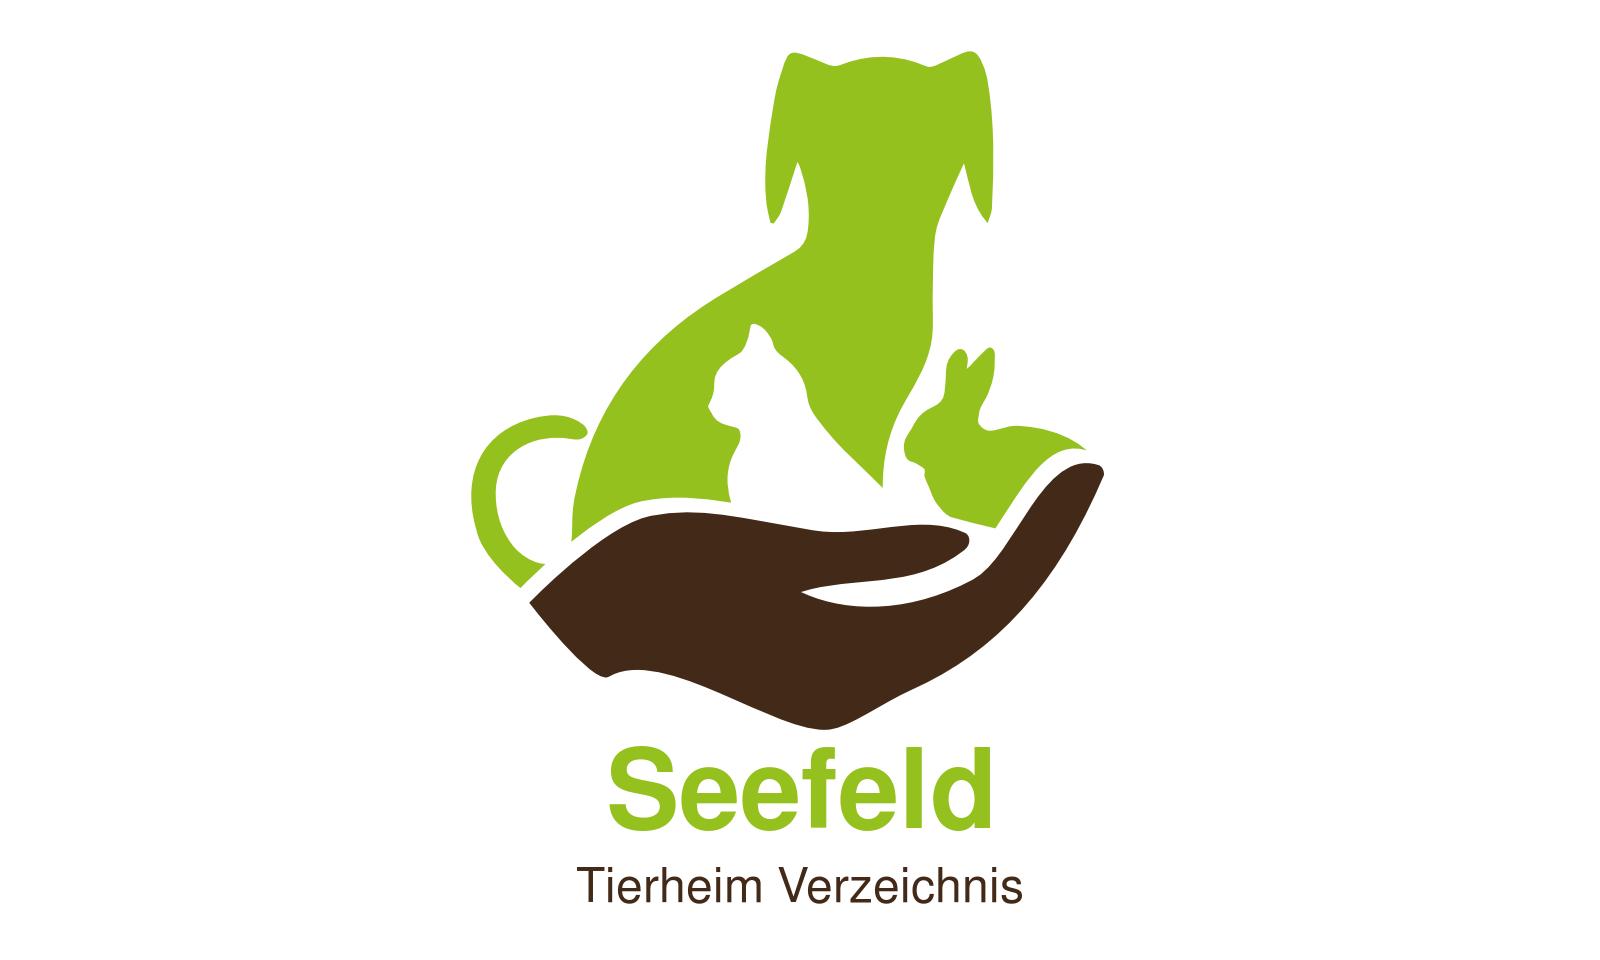 Tierheim Seefeld